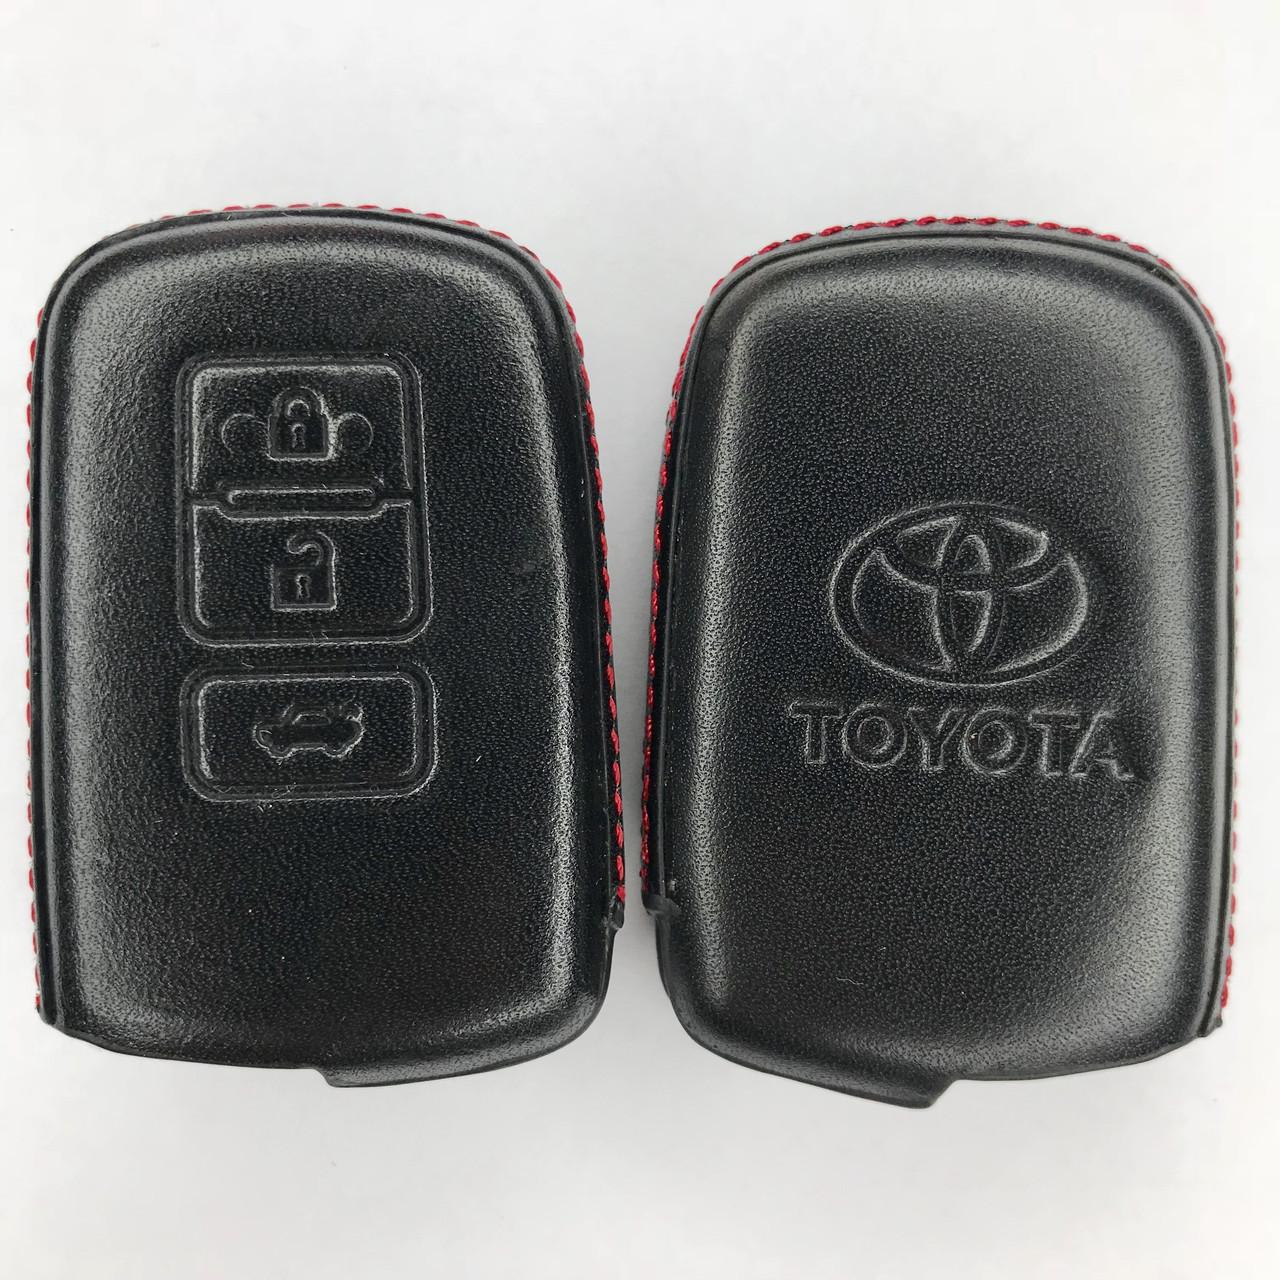 Кожаный чехол для ключа Toyota Yaris,Auris,Highlander, Land Cruiser,Rav4,Camry,Corolla, Avalon,Avensis